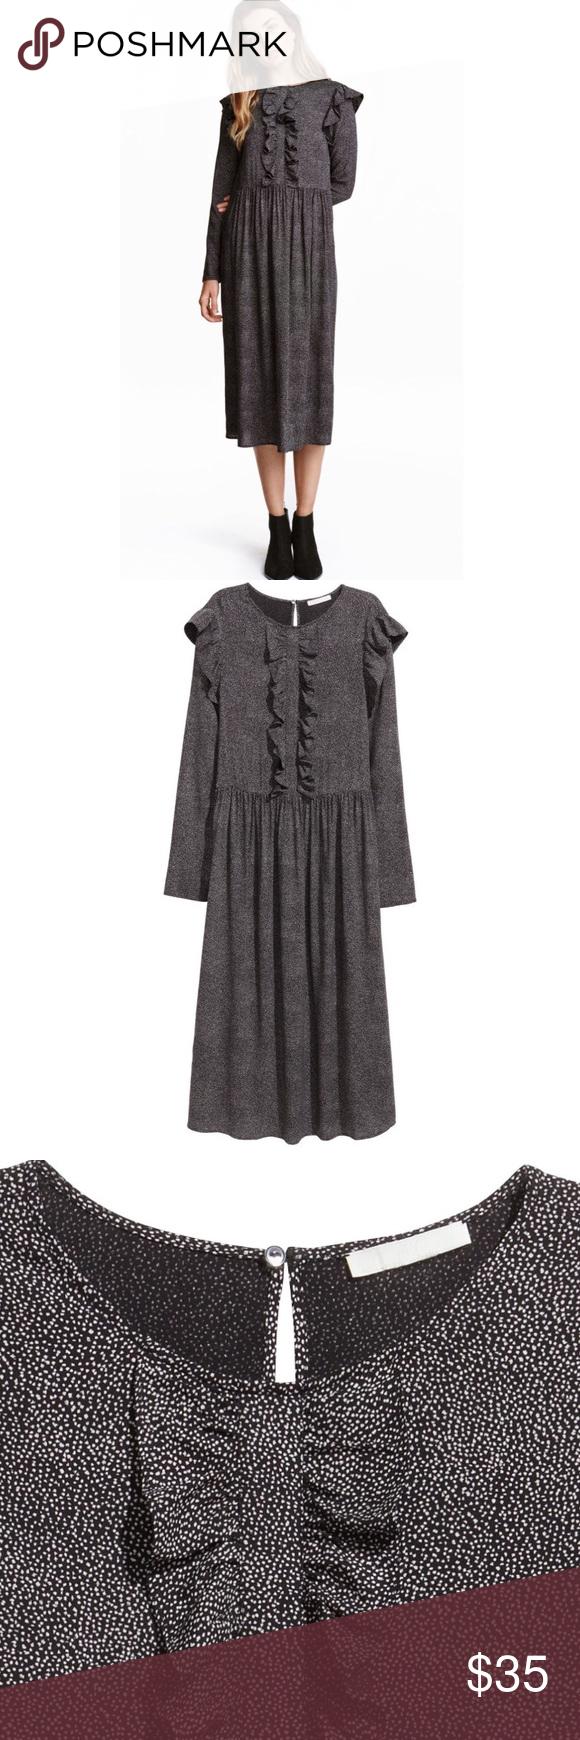 Ysl saint laurent dress style lookalike boutique